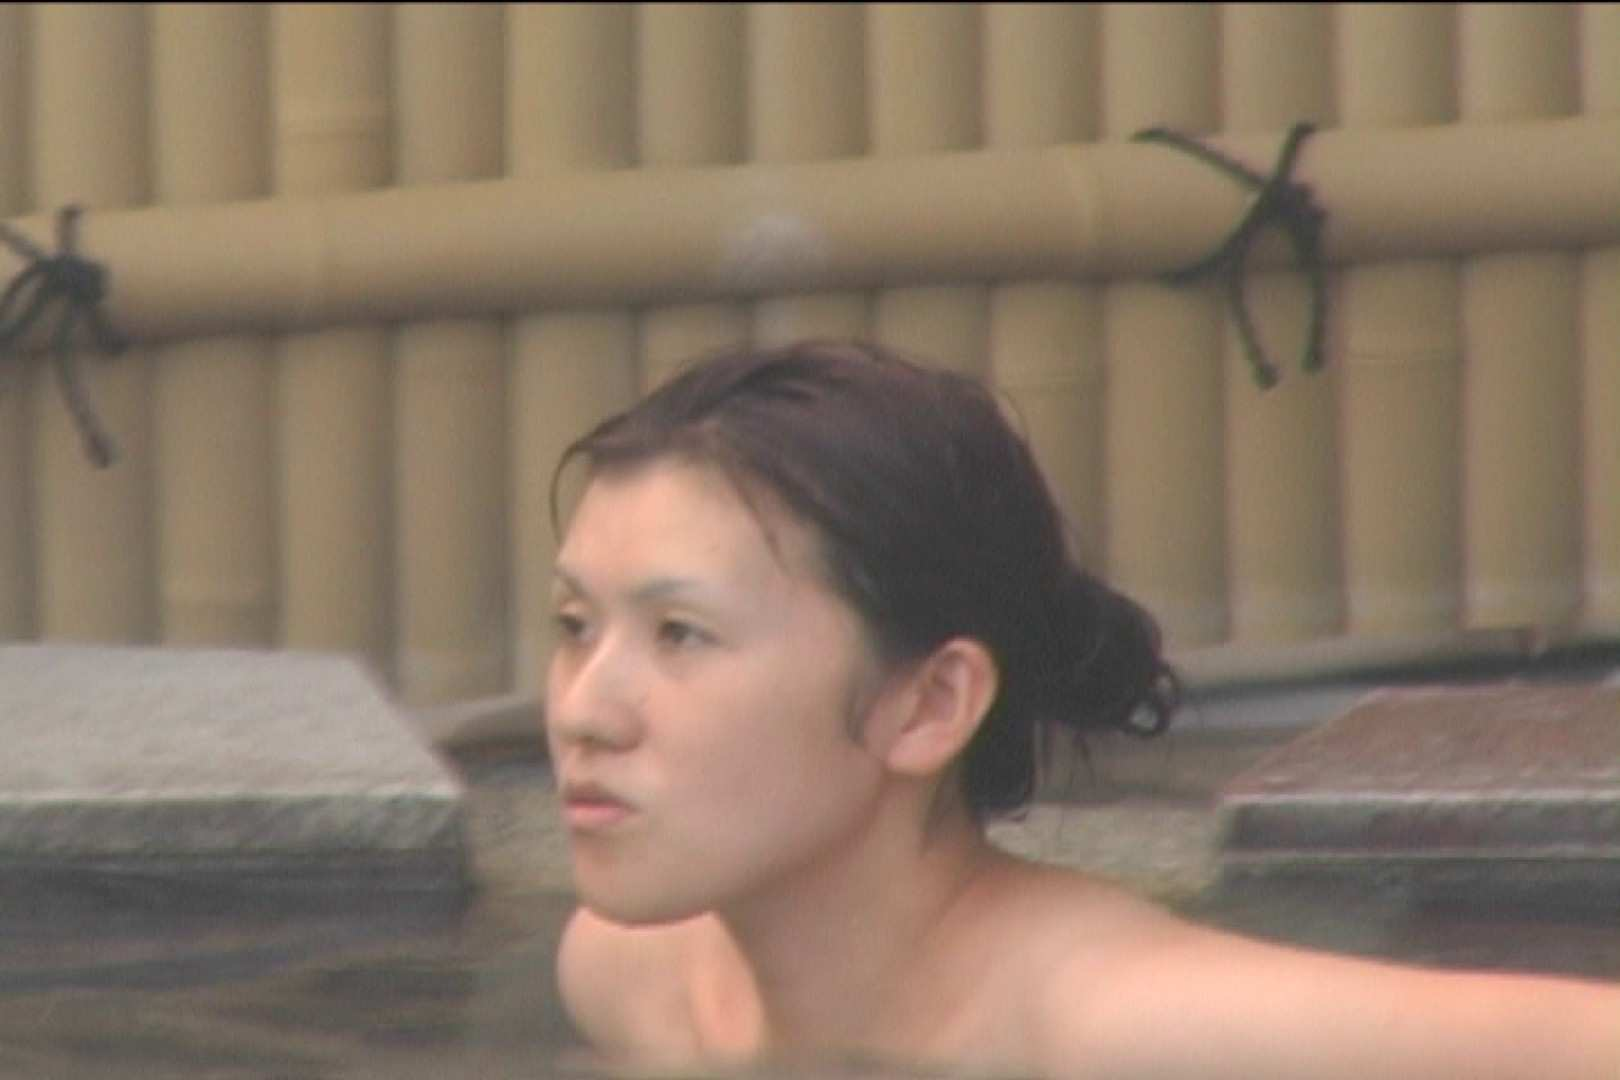 Aquaな露天風呂Vol.532 盗撮シリーズ | 露天風呂編  104PIX 39